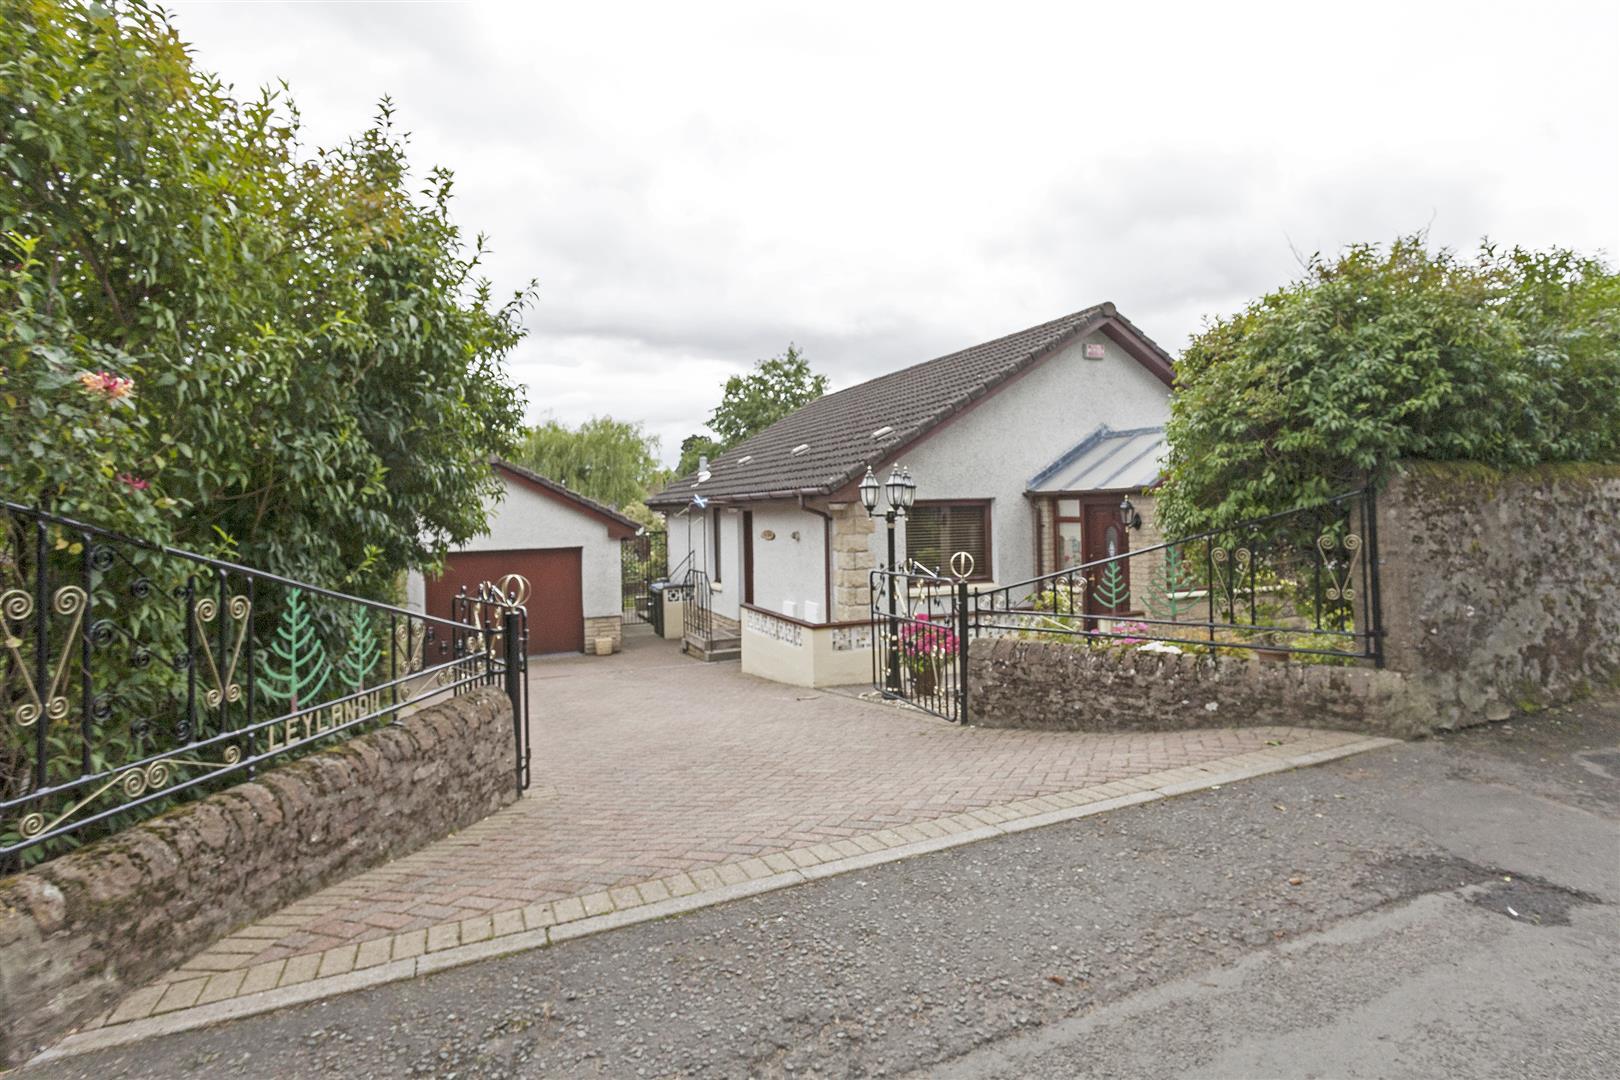 Leylandii, Losset Road, Alyth, Perthshire, PH11 8BT, UK